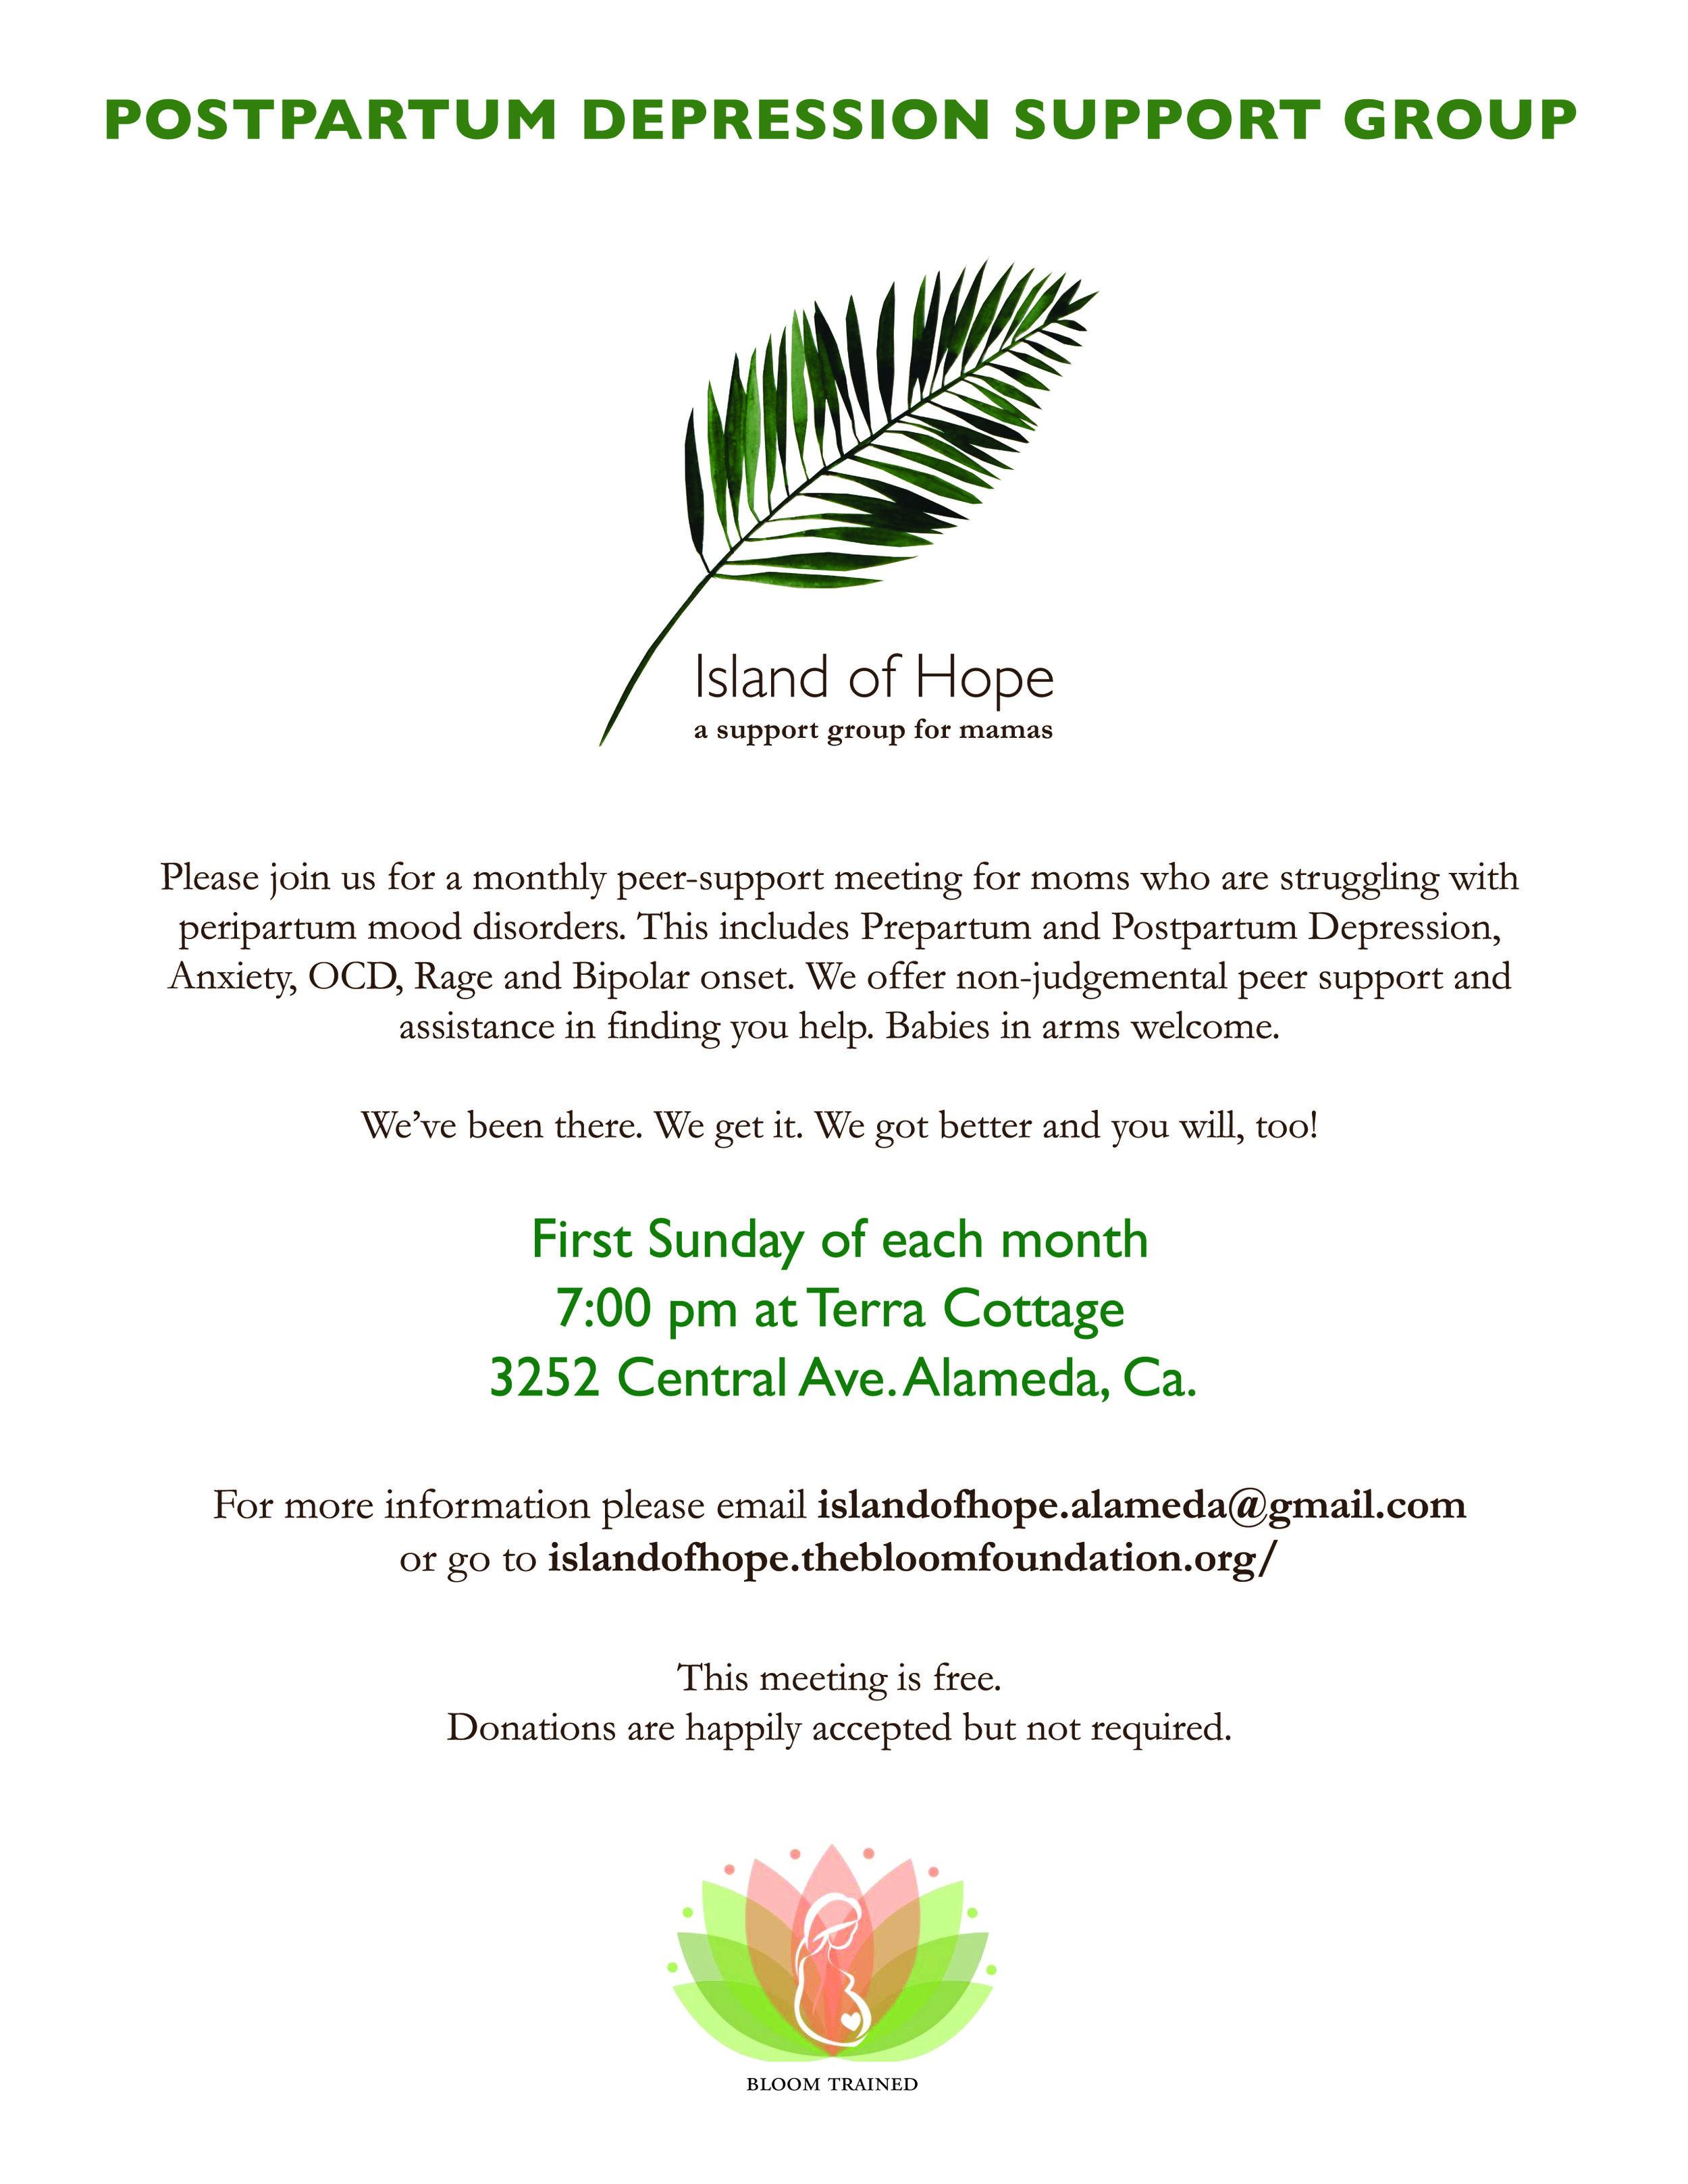 Island of Hope flyer.jpg